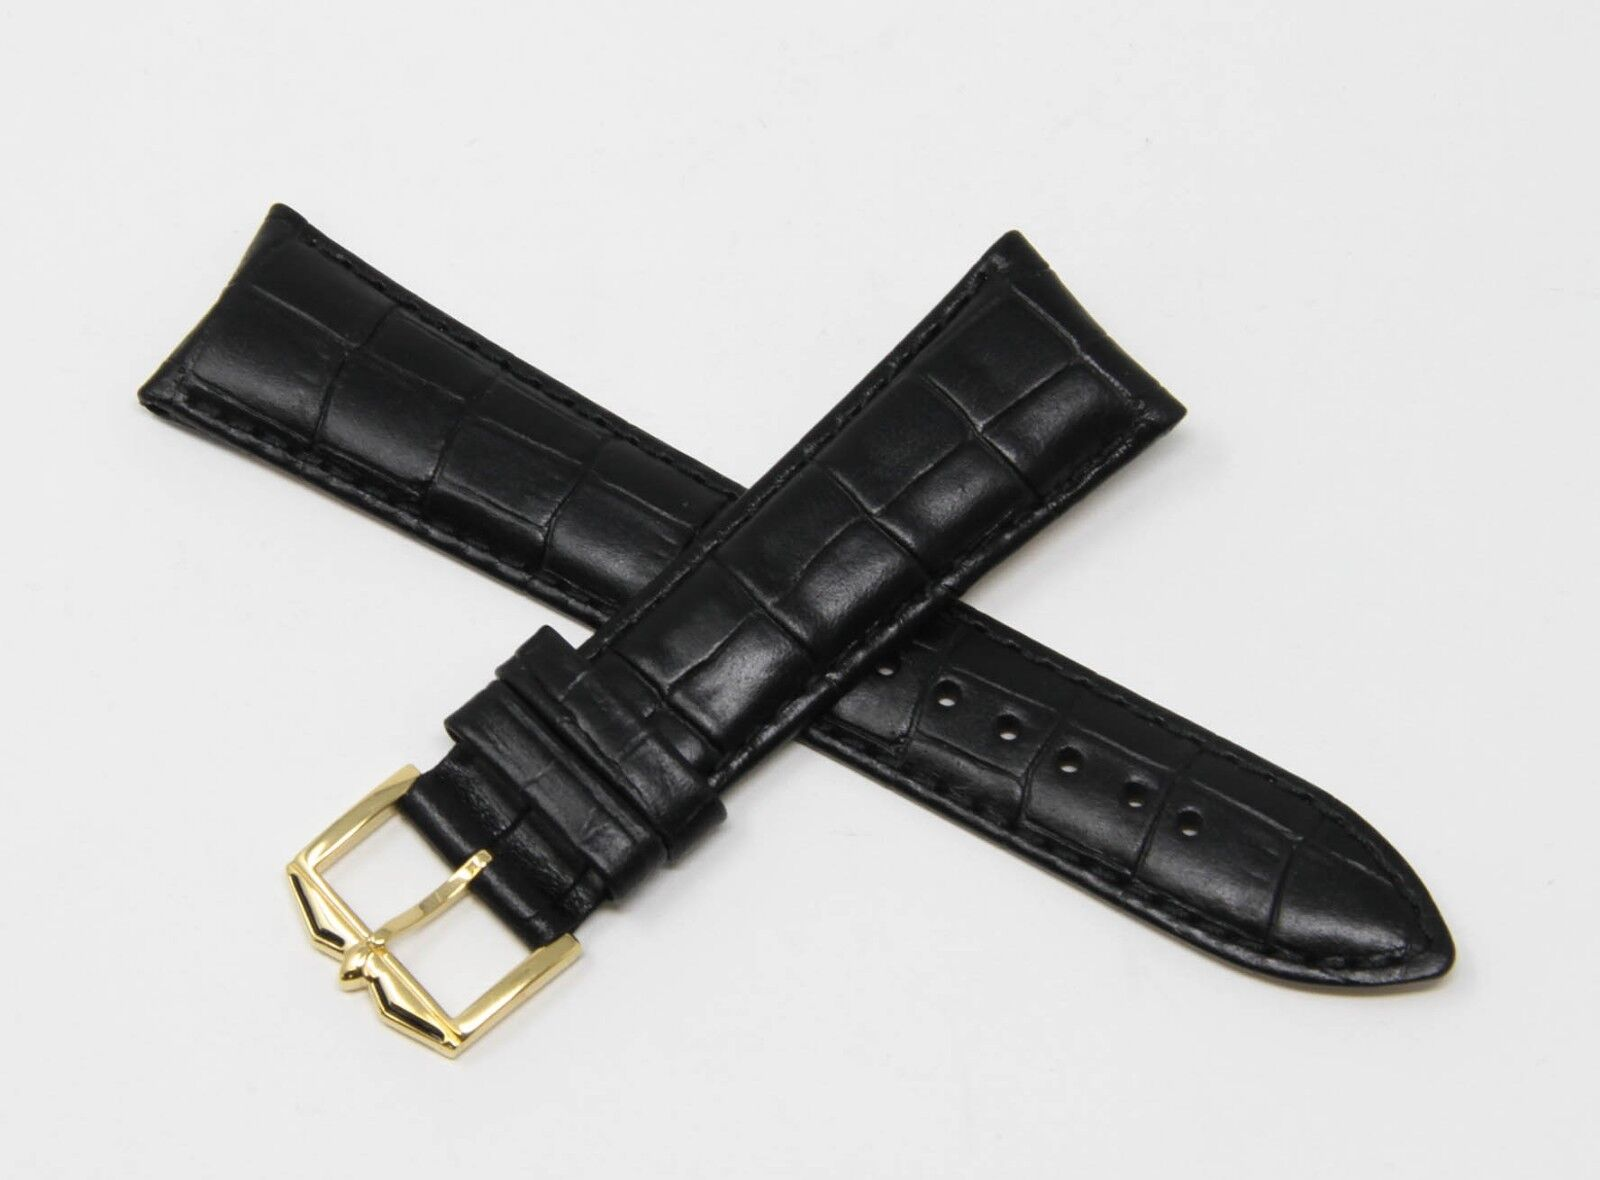 Rotary Uhrenband Echt Leder in Kroko Optik 22 mm Schwarz